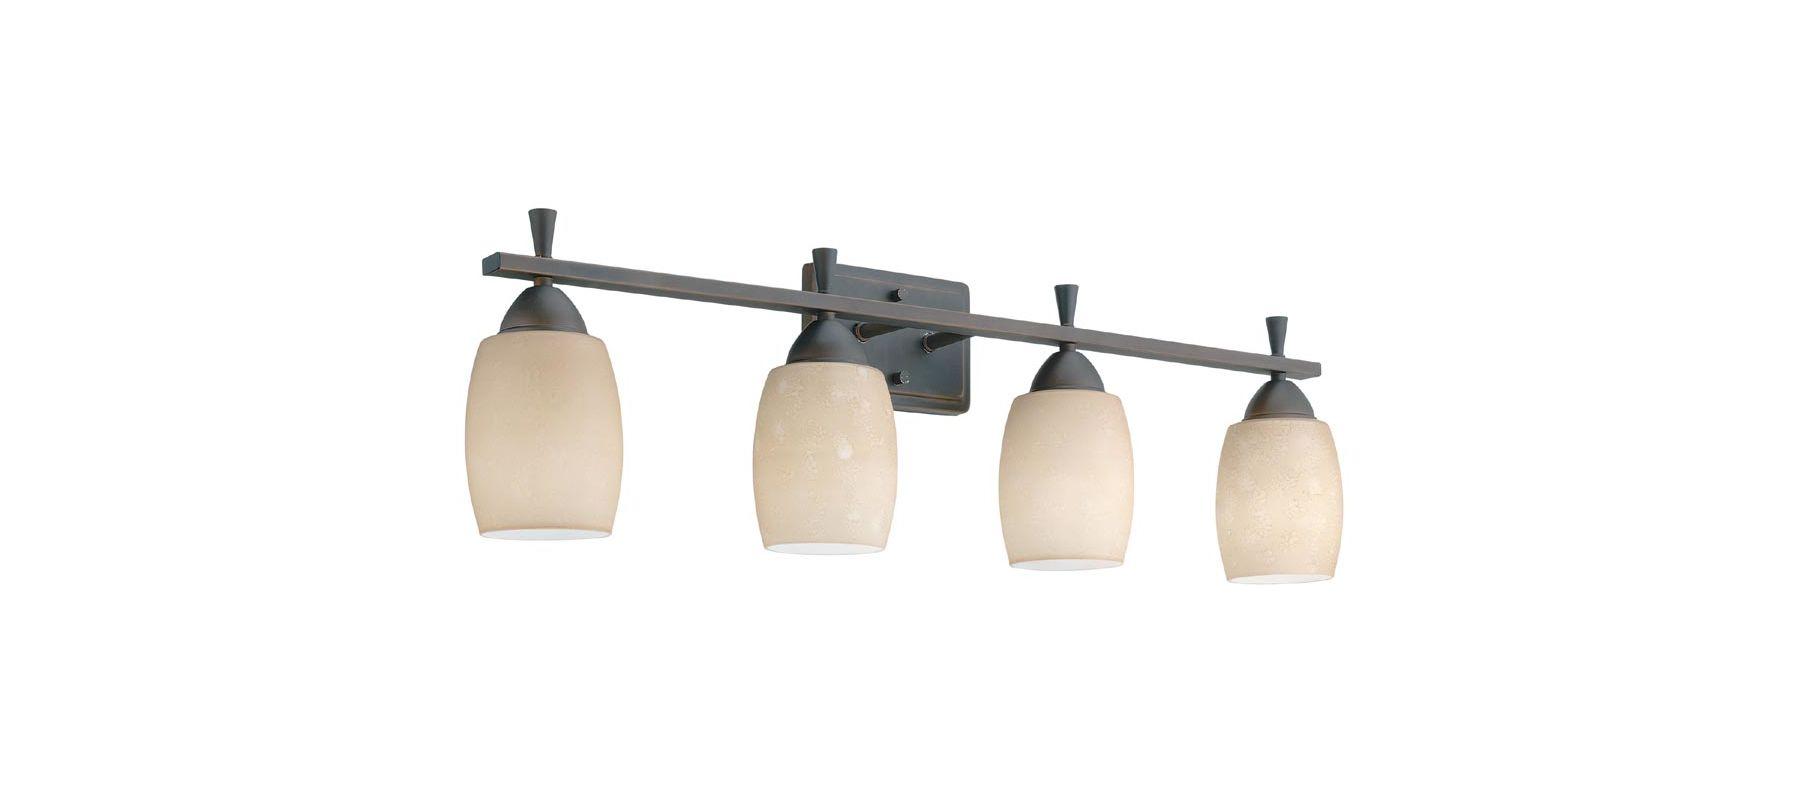 "Lithonia Lighting 11534 33.75"" Wide Ferros 4 Light Vanity Antique"